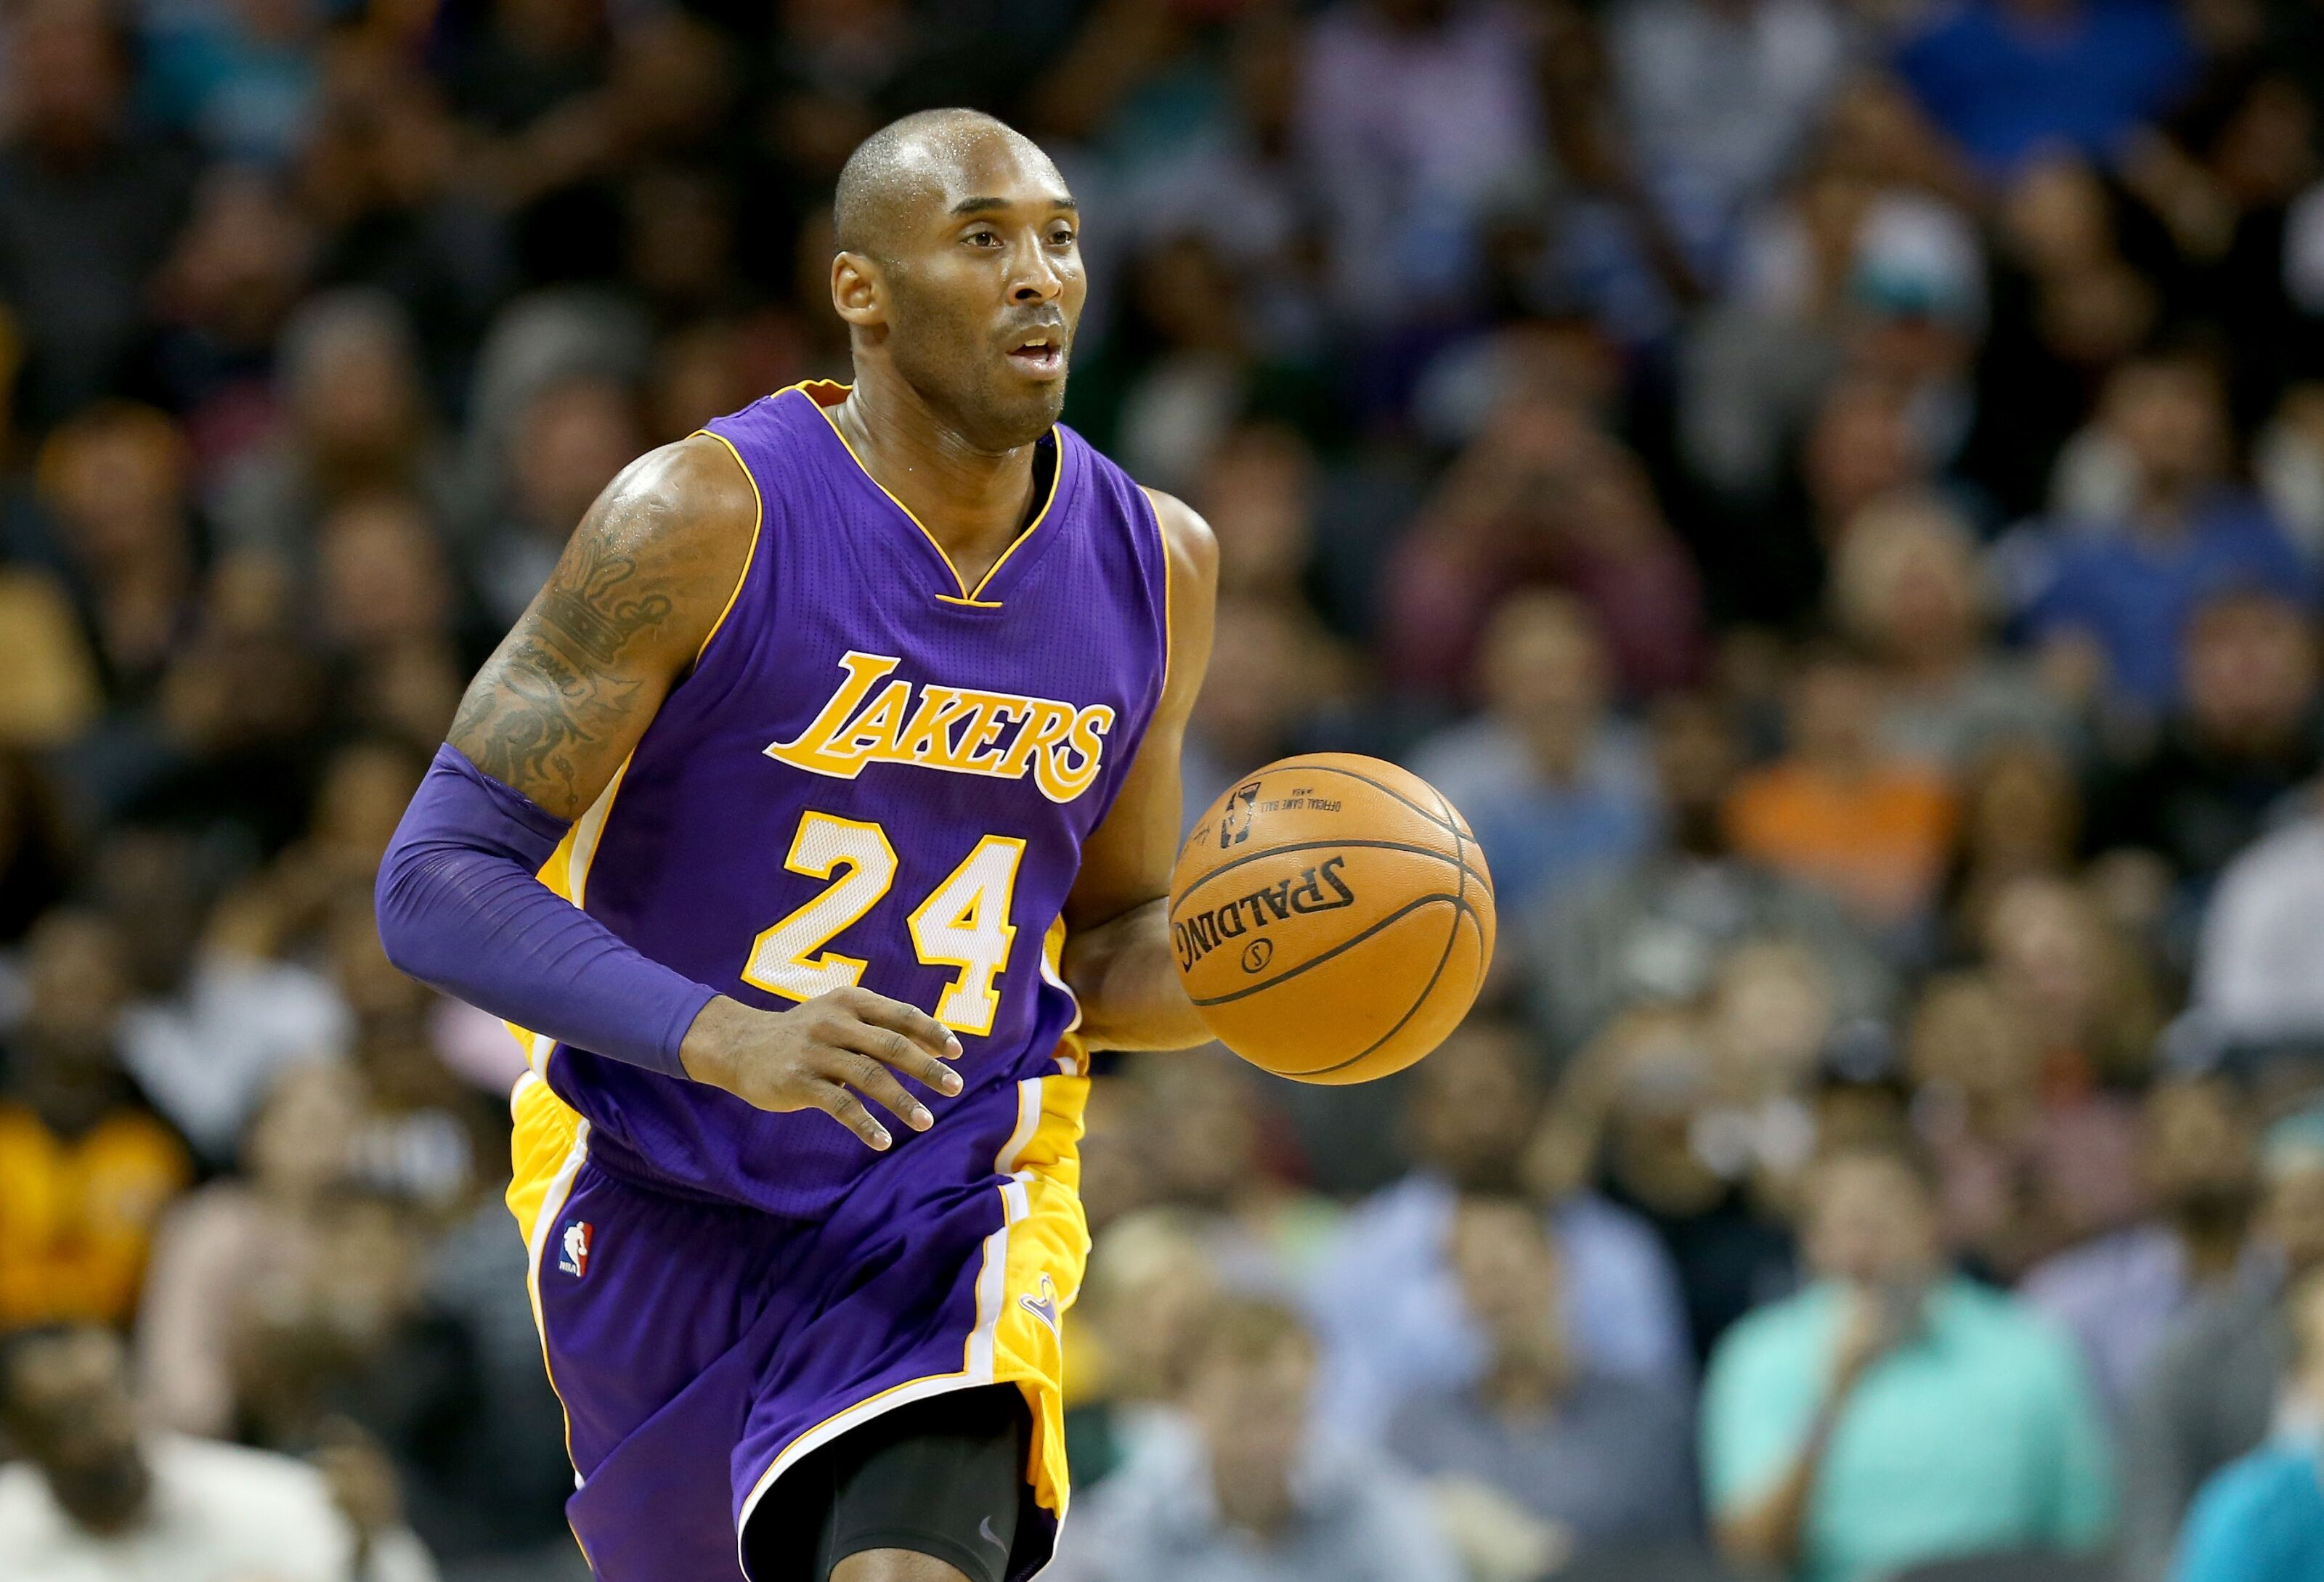 Charlotte Hornets: Fans want Kobe Bryant's jersey number retired